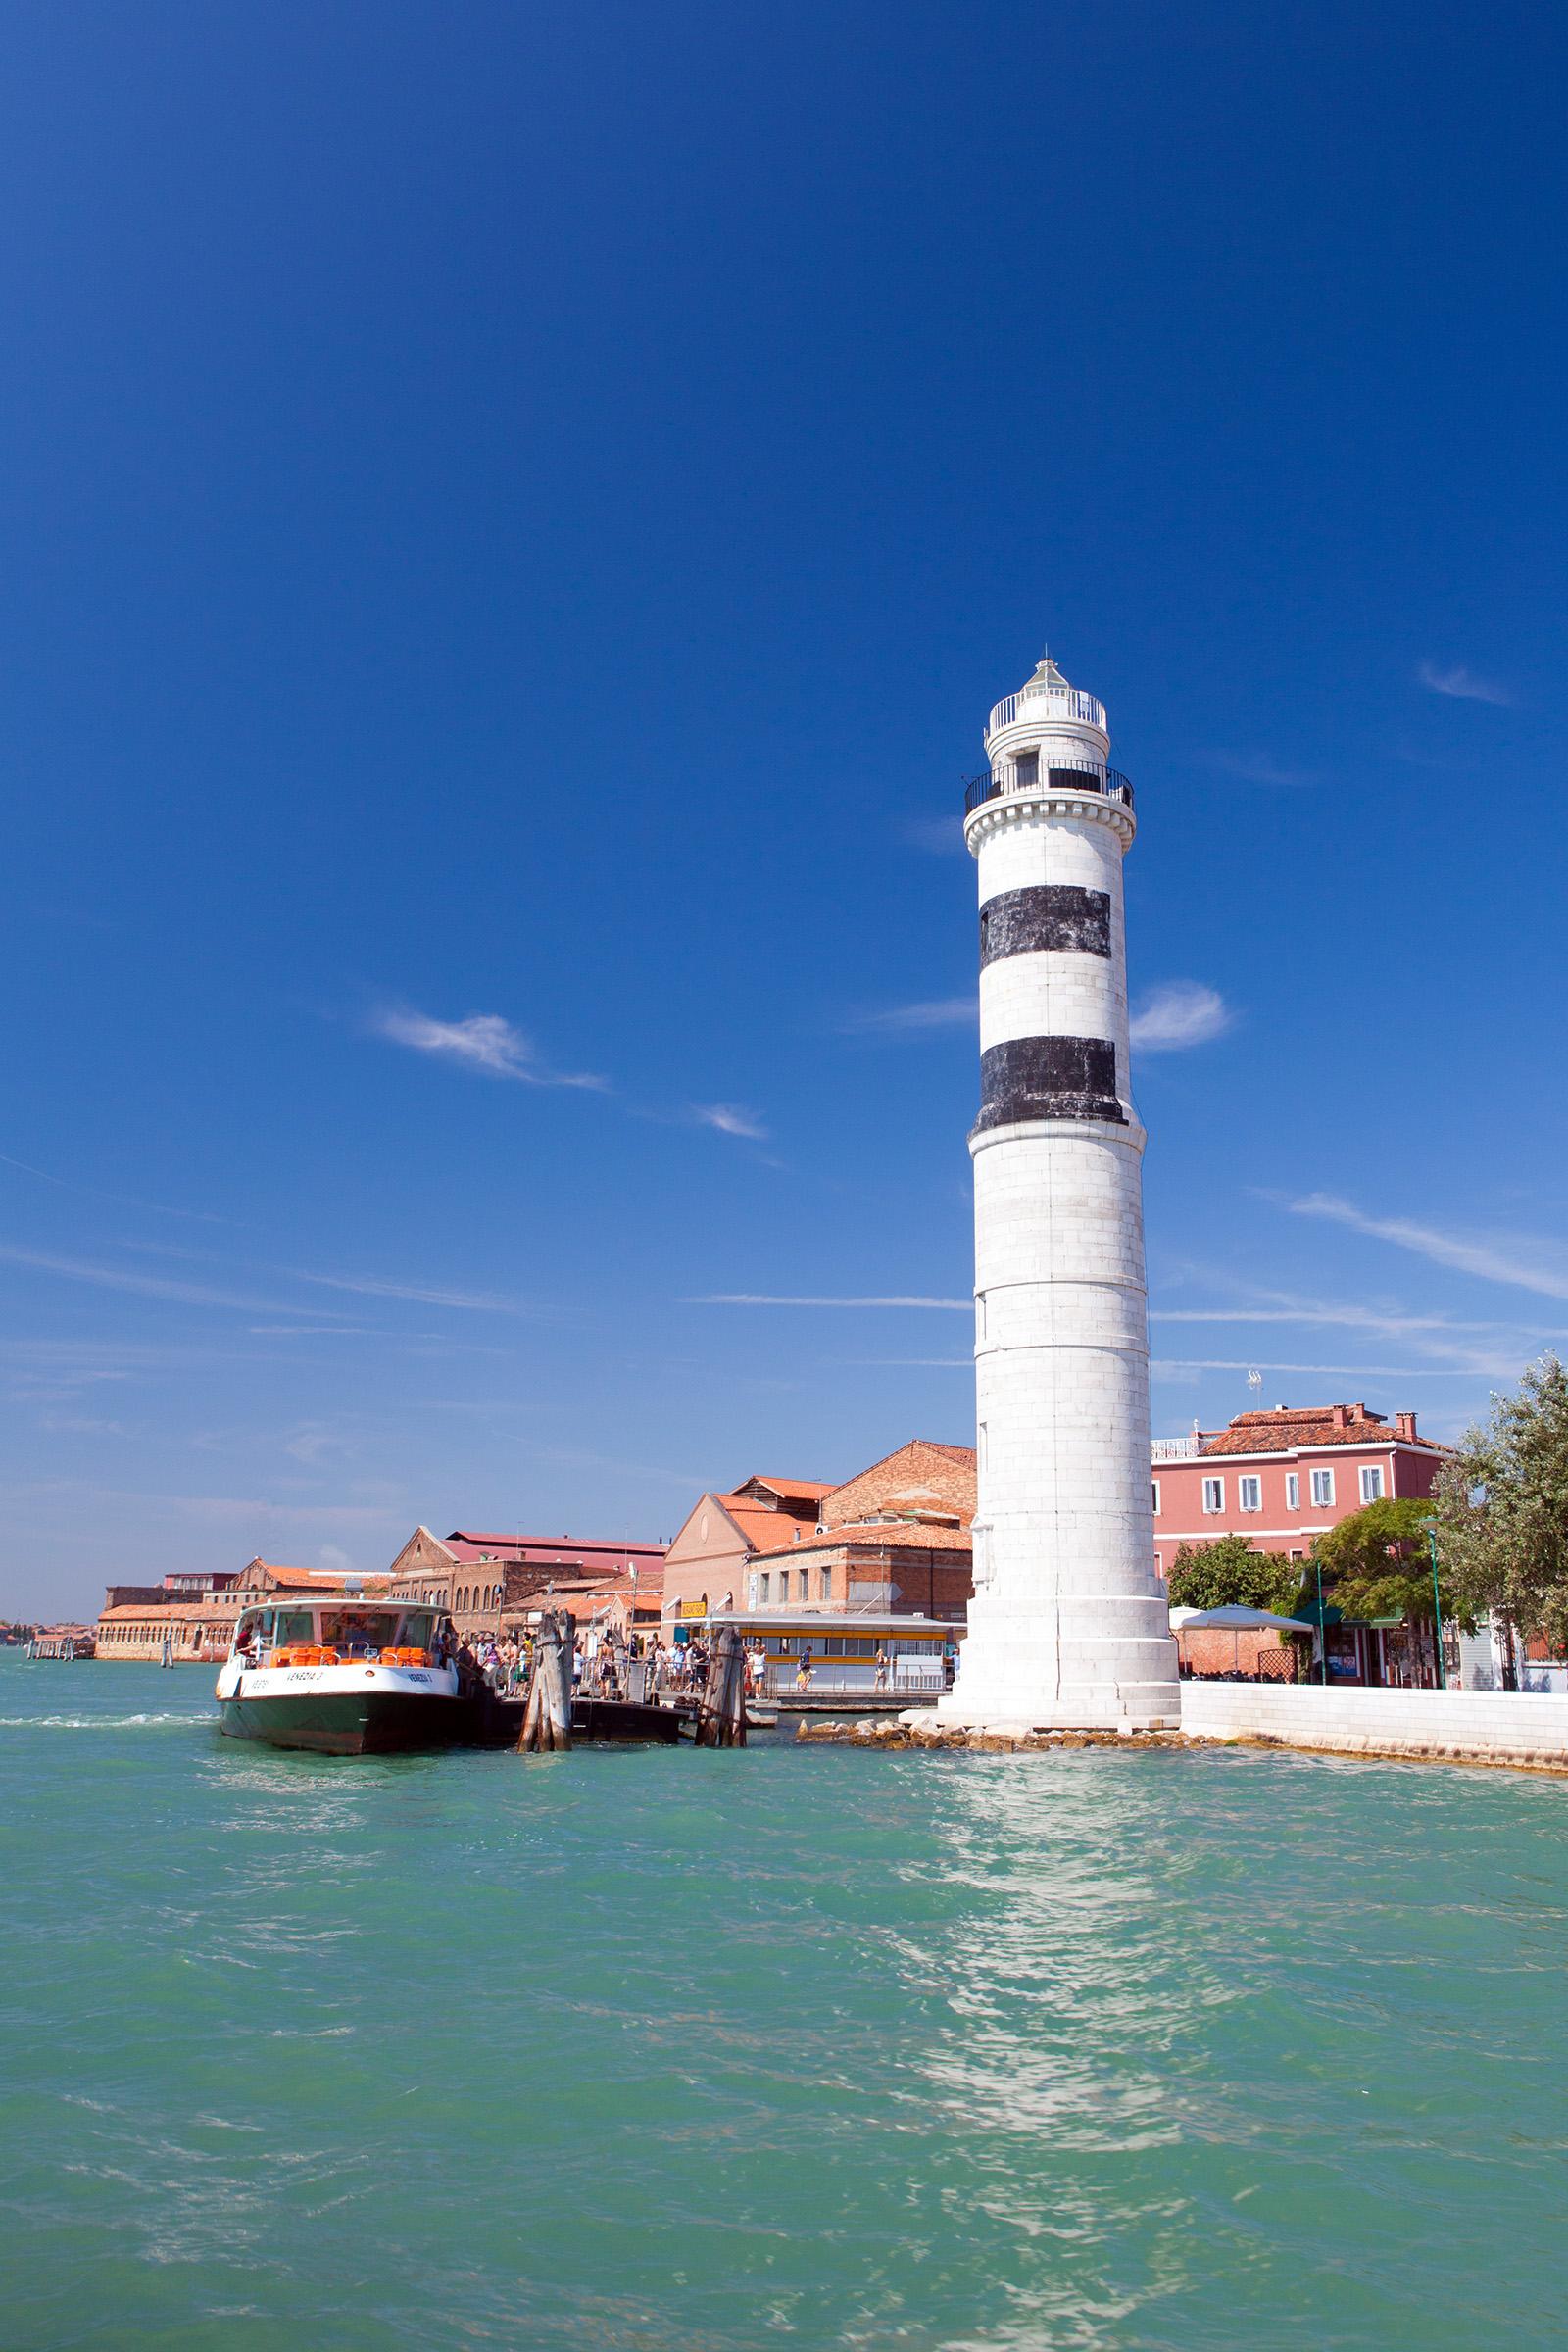 Murano lighthouse, Boat, Laguna, Venice, Venezia, HQ Photo